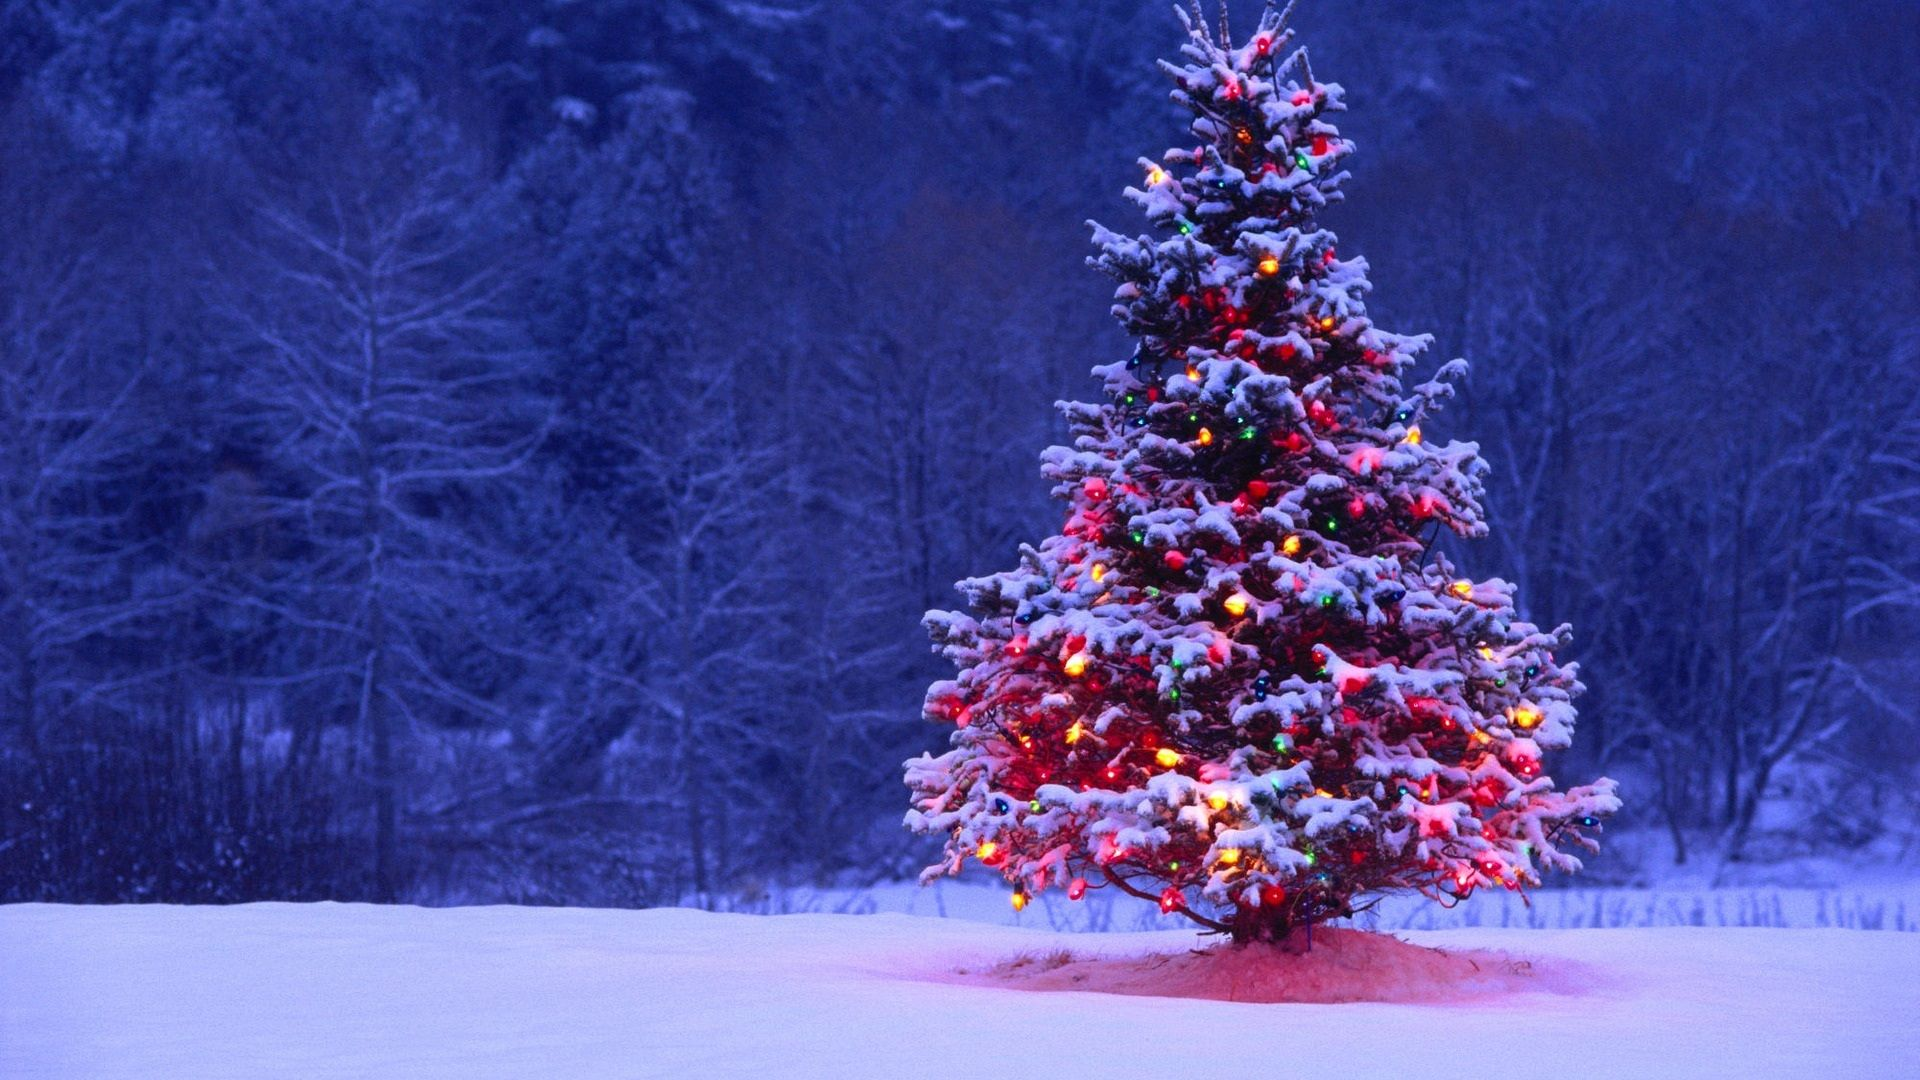 Christmas Tree good wallpaper hd